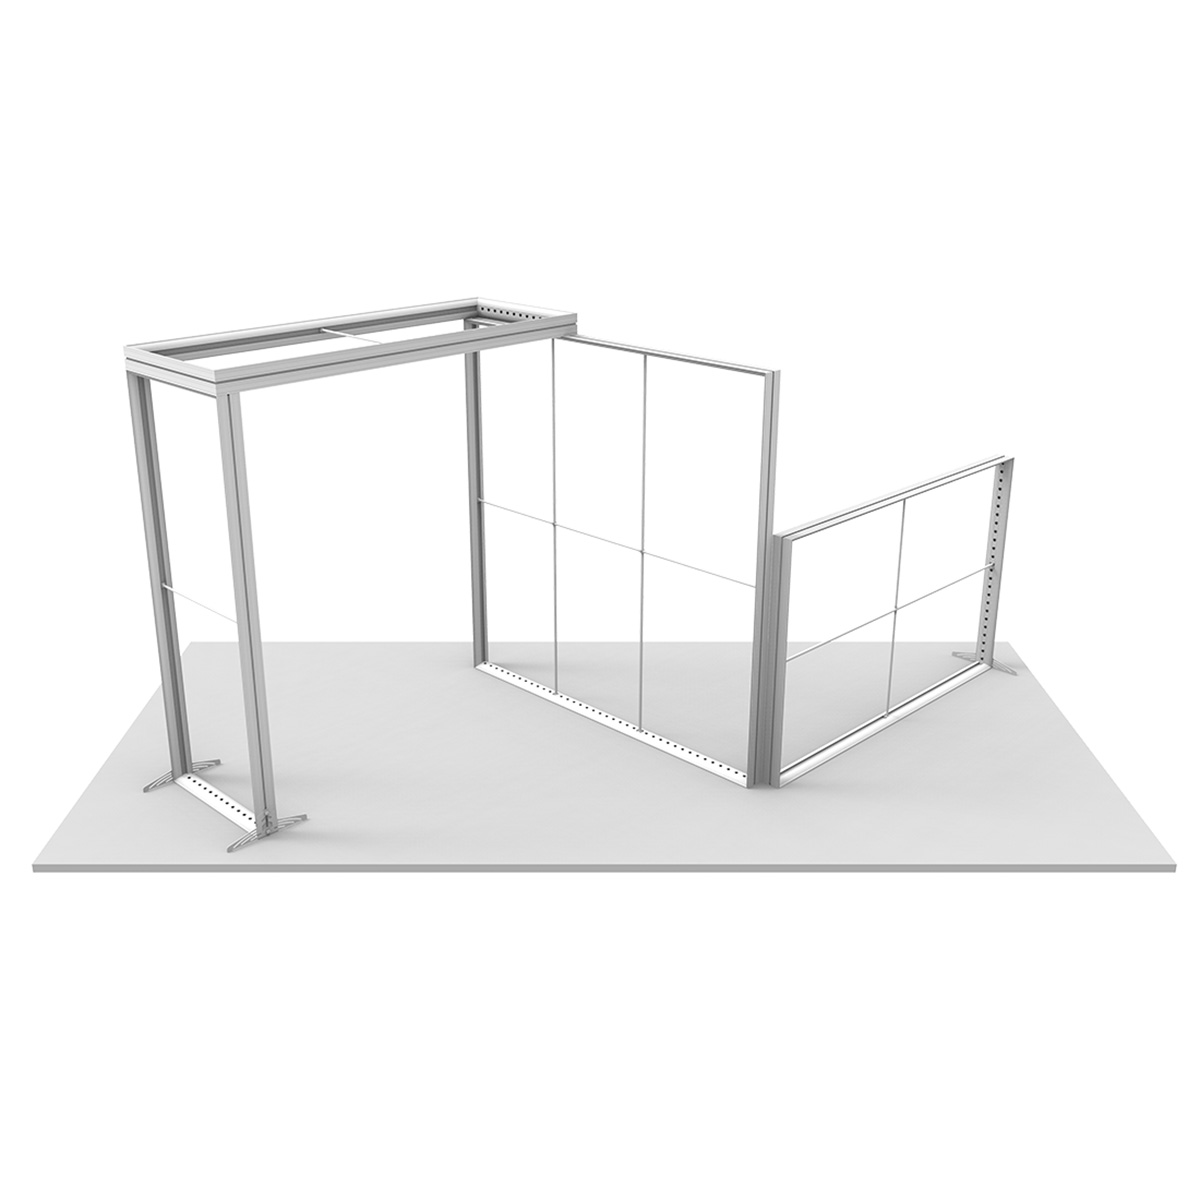 Popular Brite-Lite Lightbox Combination (10x20ft)